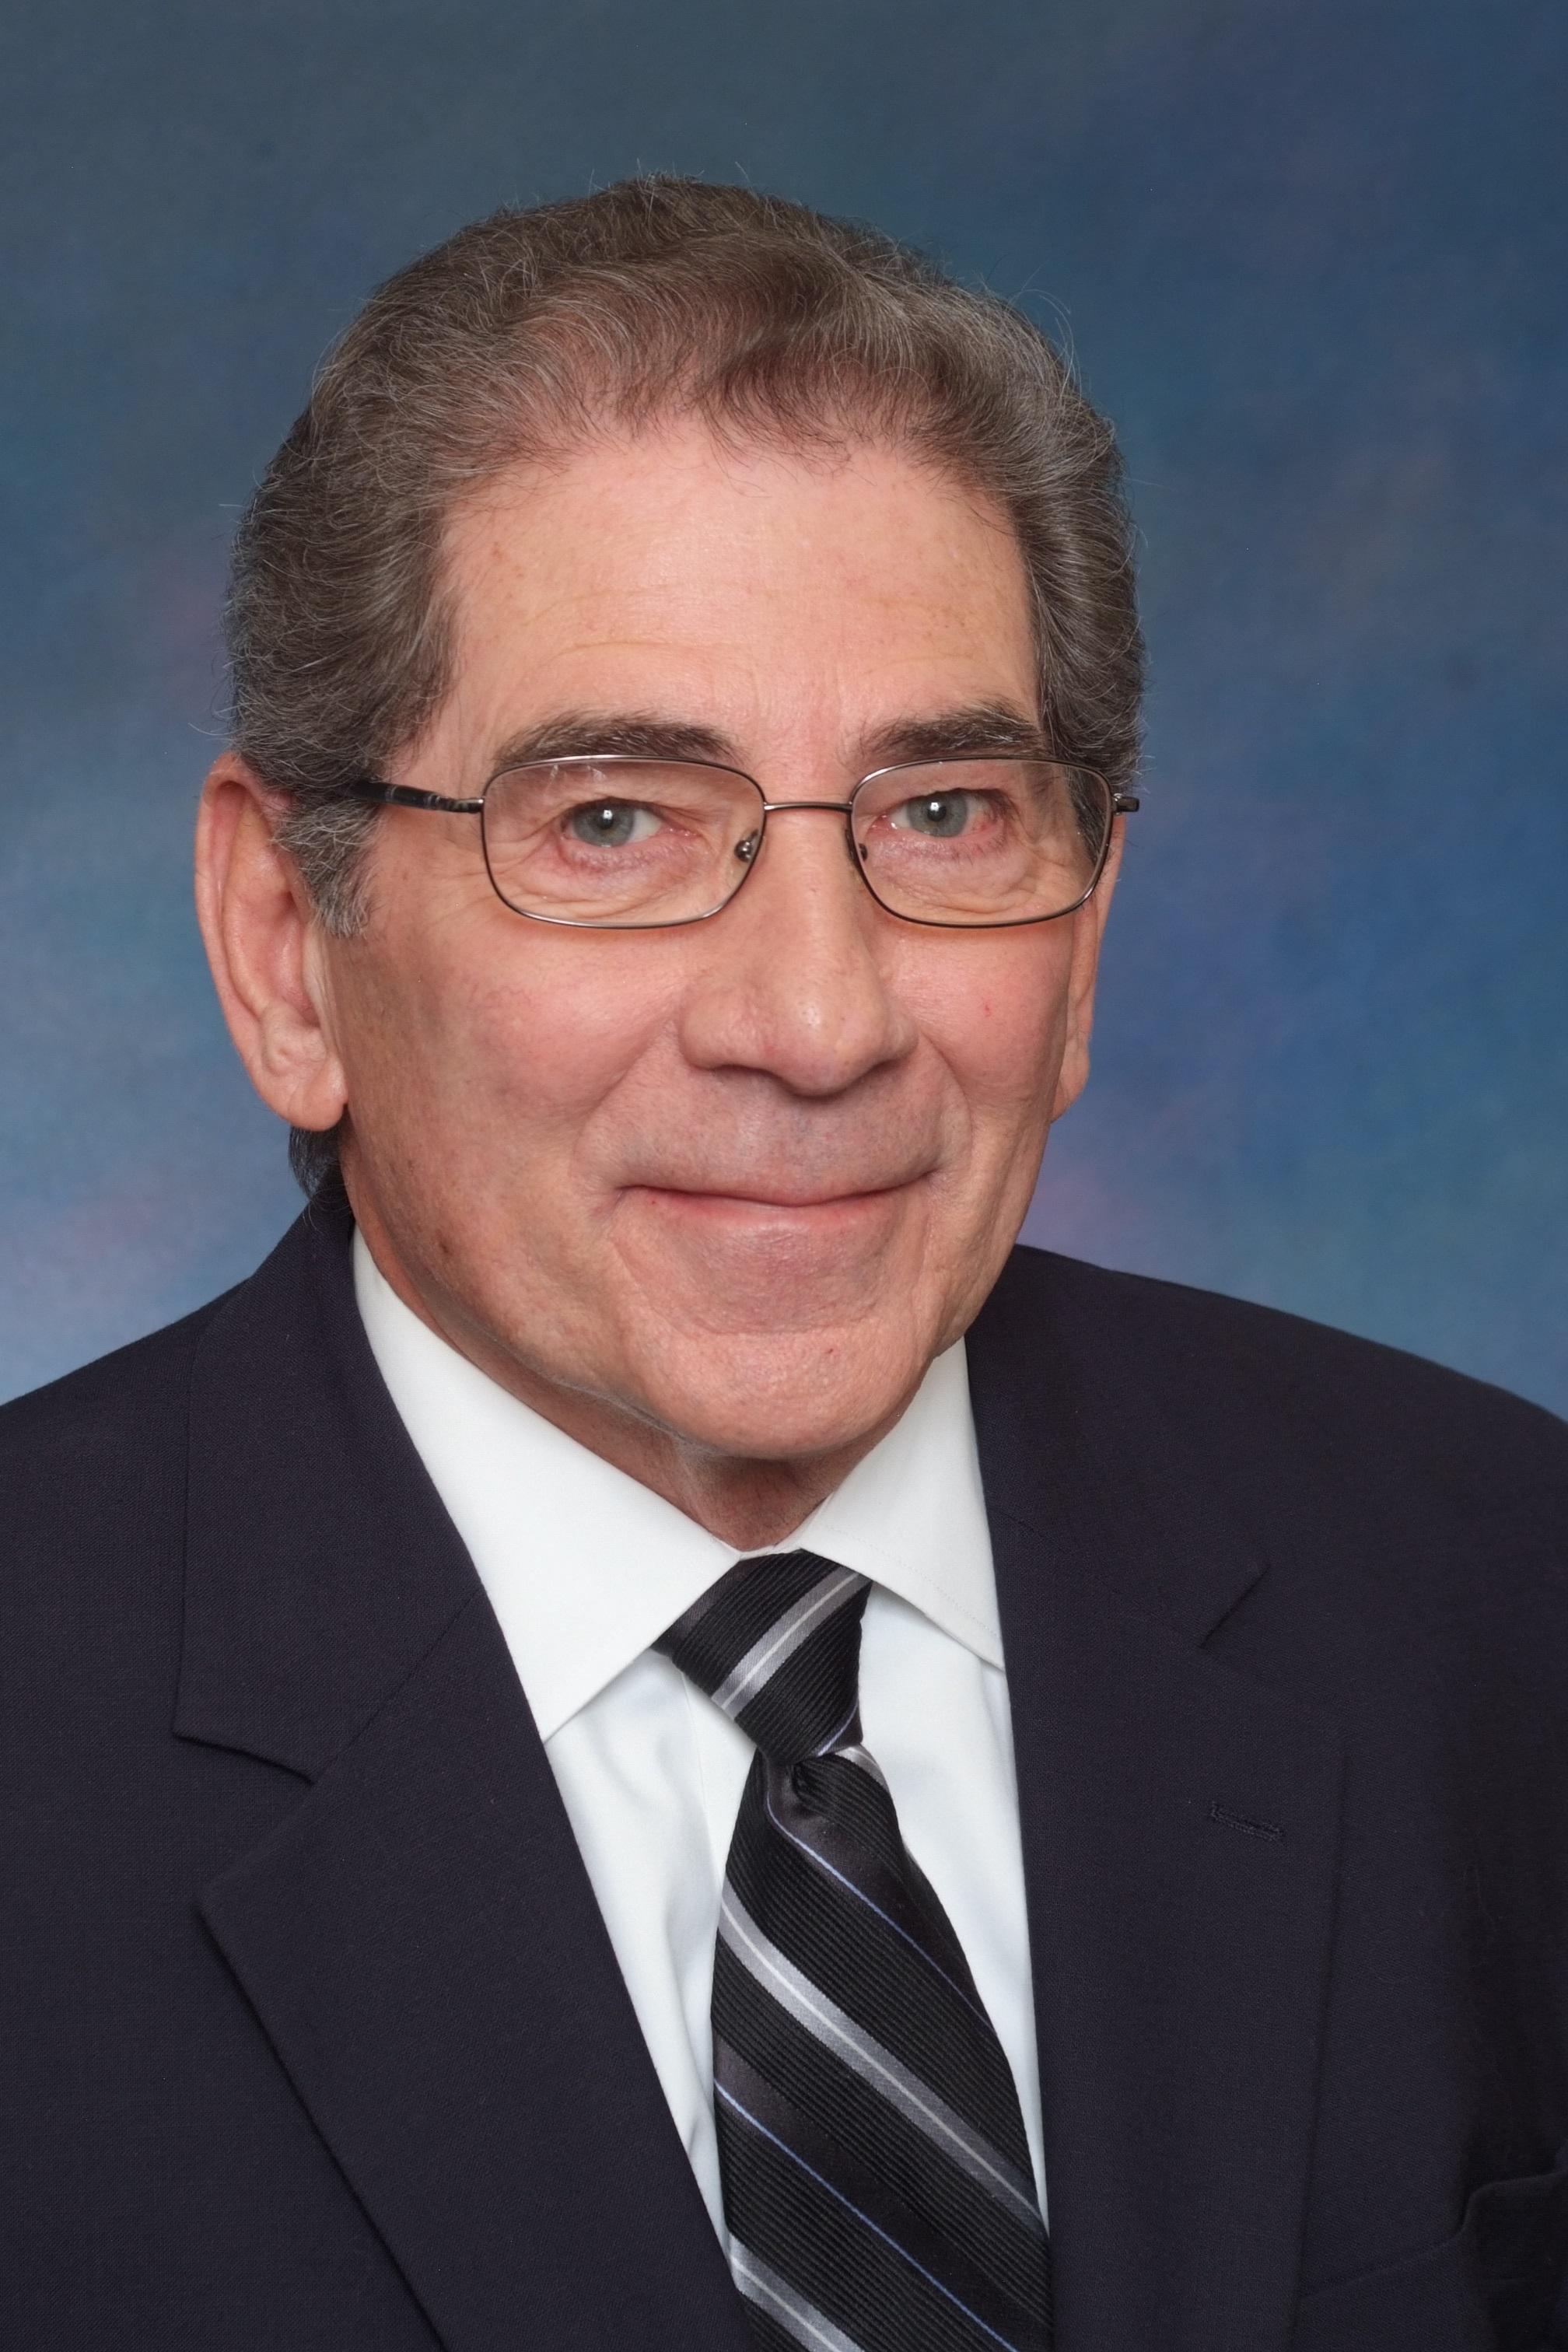 Michael Scardina